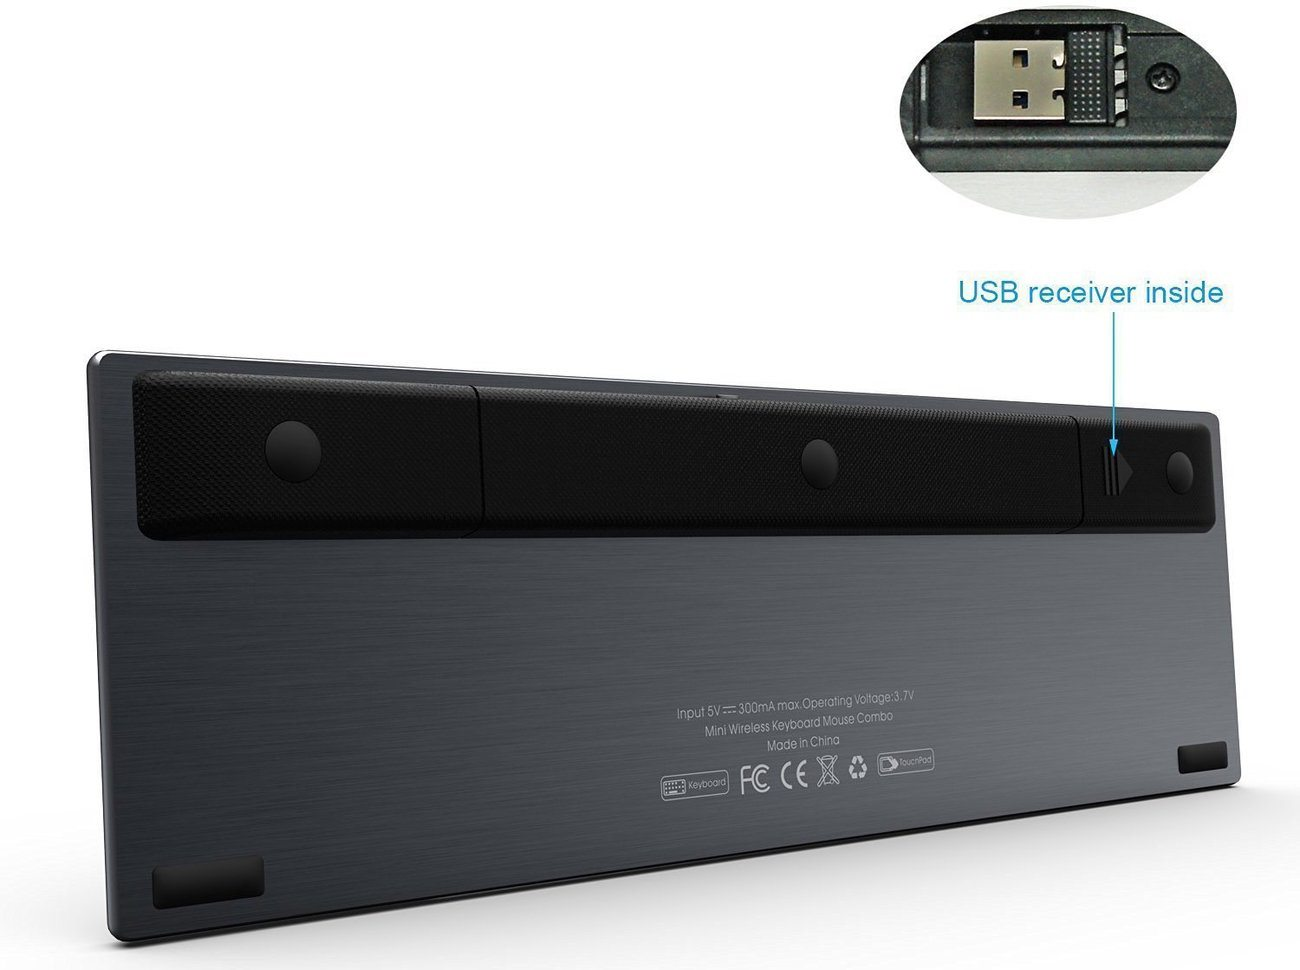 Rii Wireless Handheld Stainless Keyboard